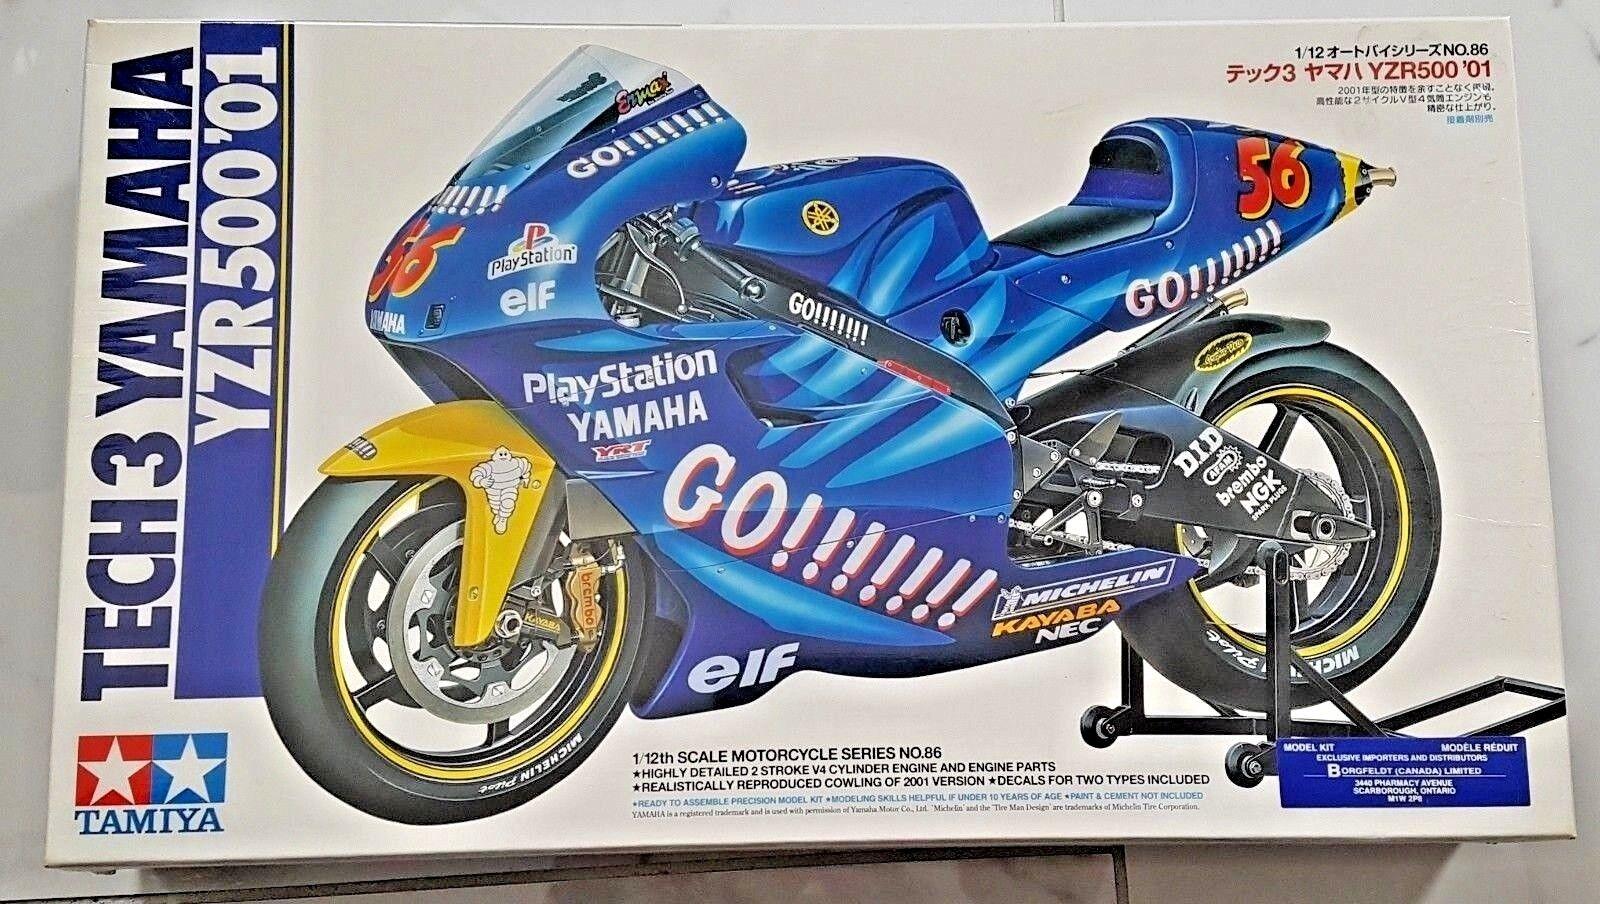 TAMIYA 1 12 TECH3 YAMAHA YZR500 '01 MotoGP JACQUE NAKANO MOTORCYCLE KIT 14086 FS